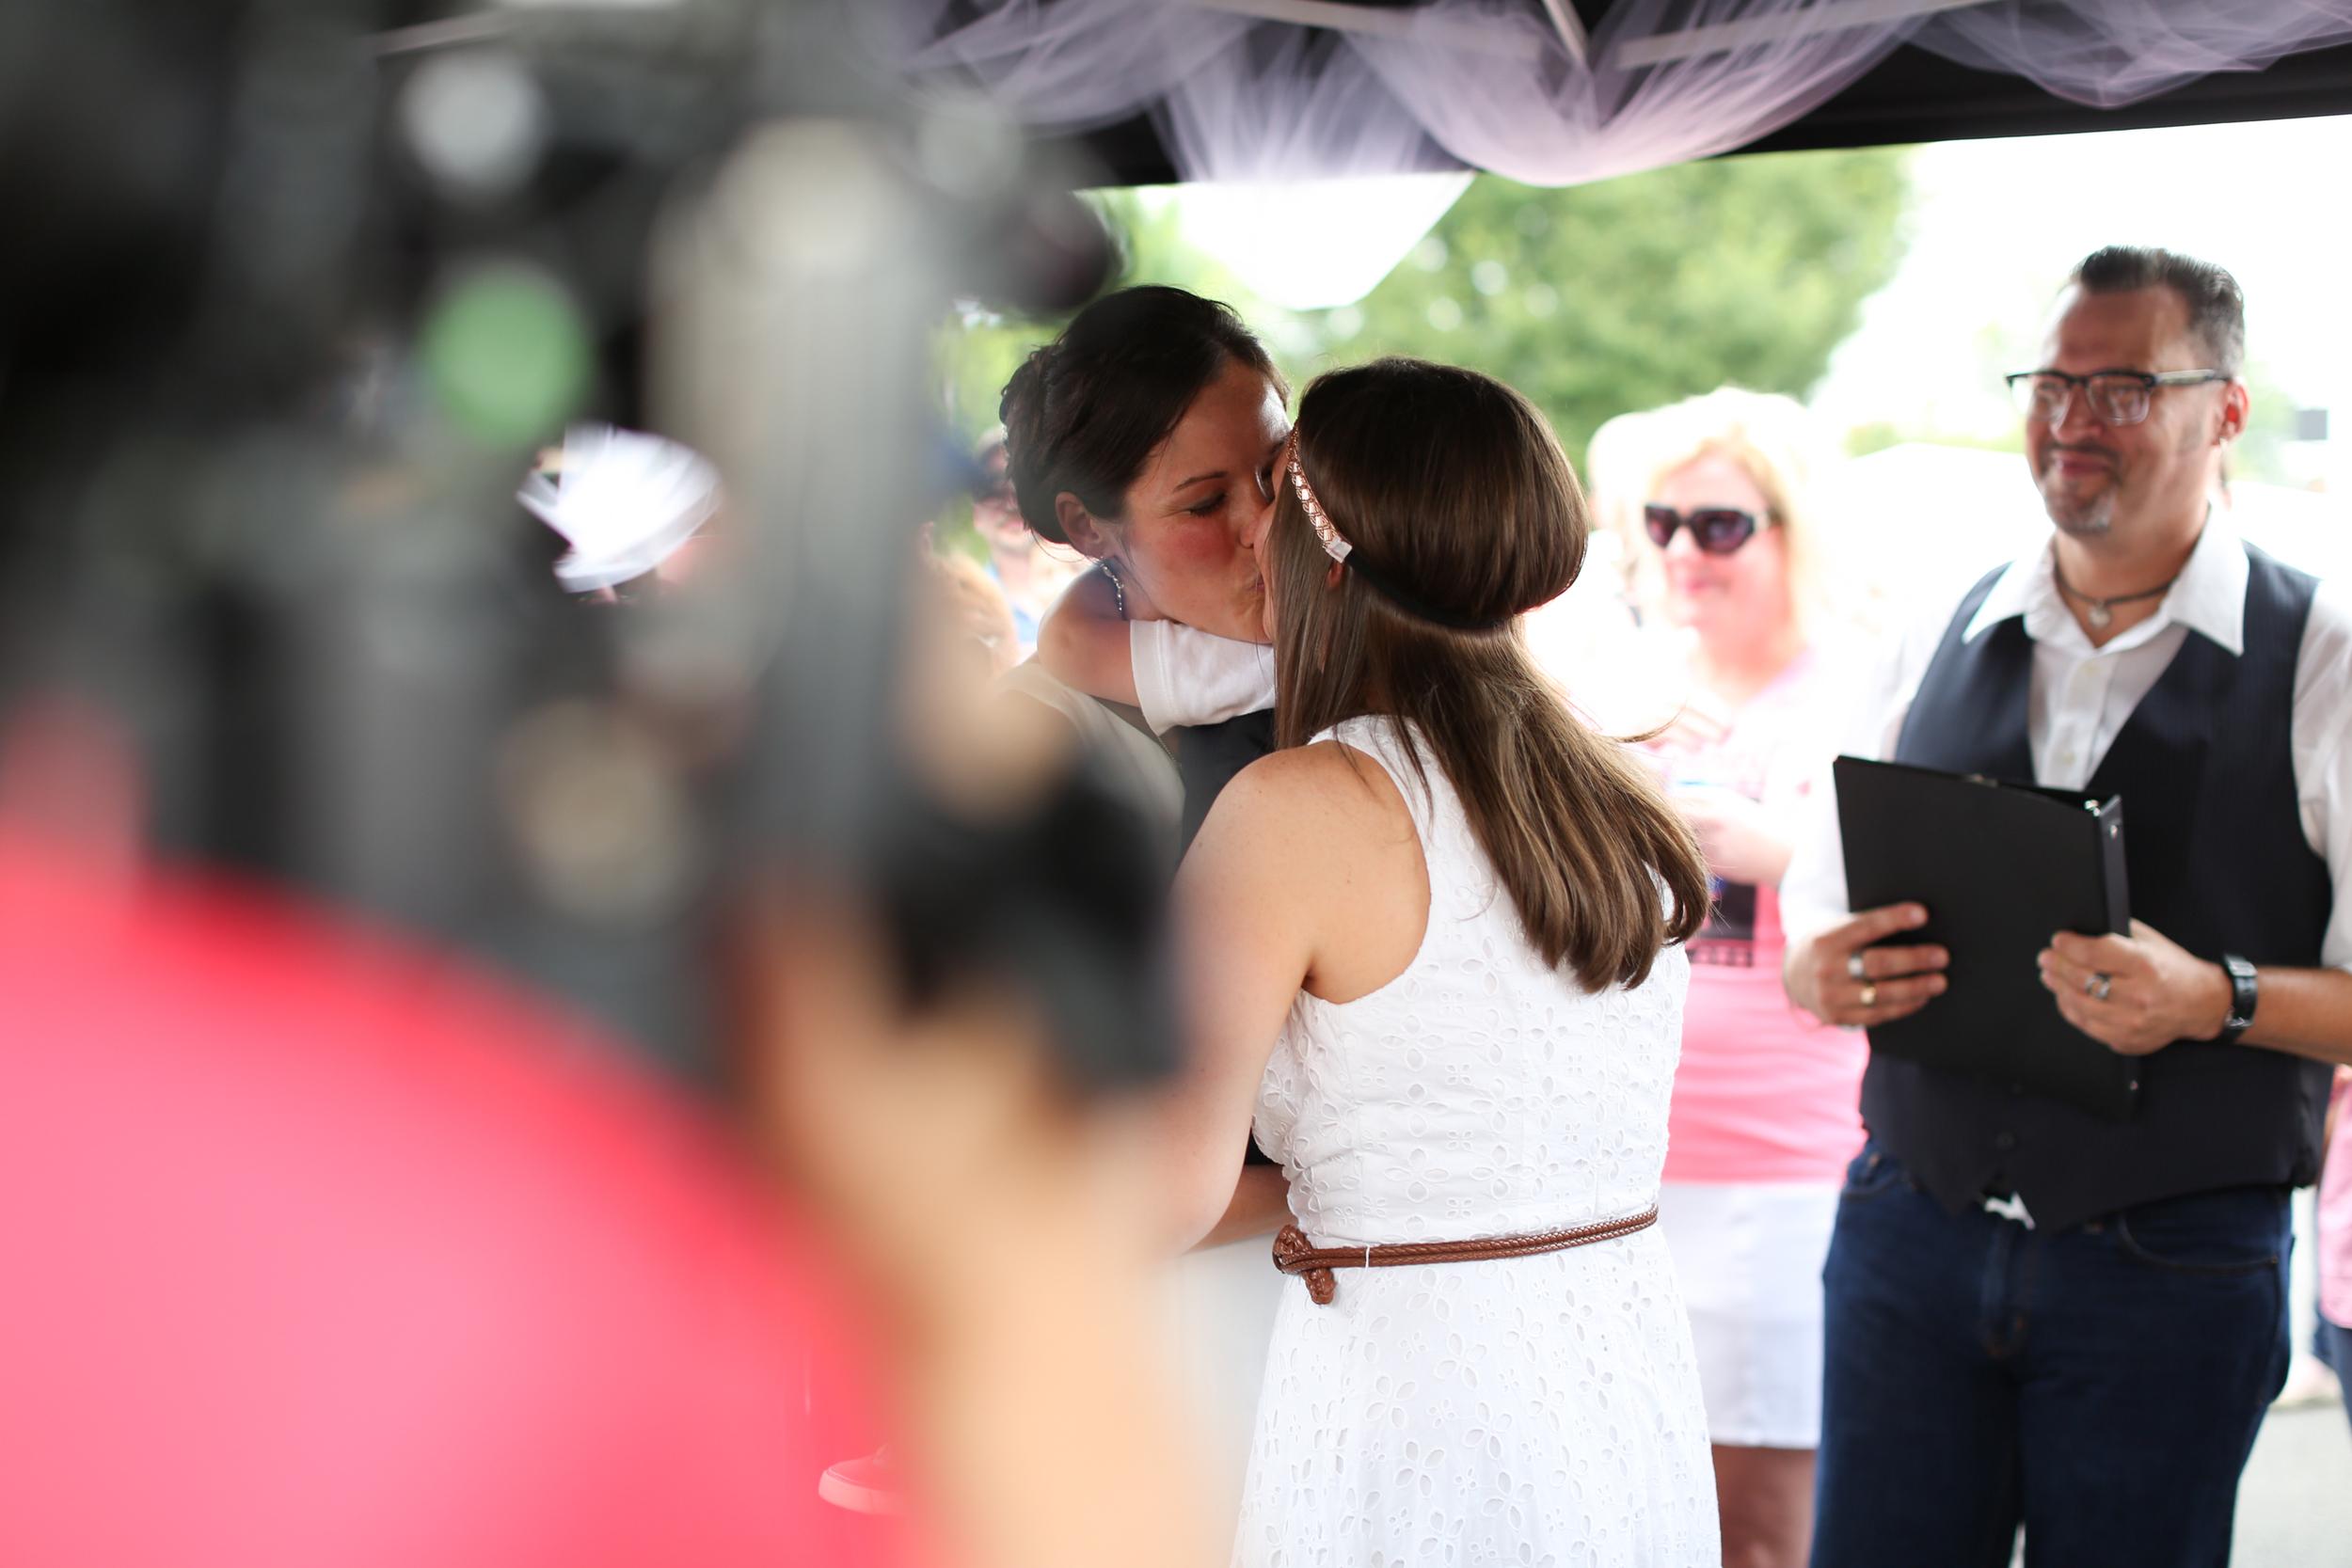 FEVA TAPROOM MARRIAGE CELBRATION SCOTUS RULING 2015 WEBSITE  (52 of 91).jpg